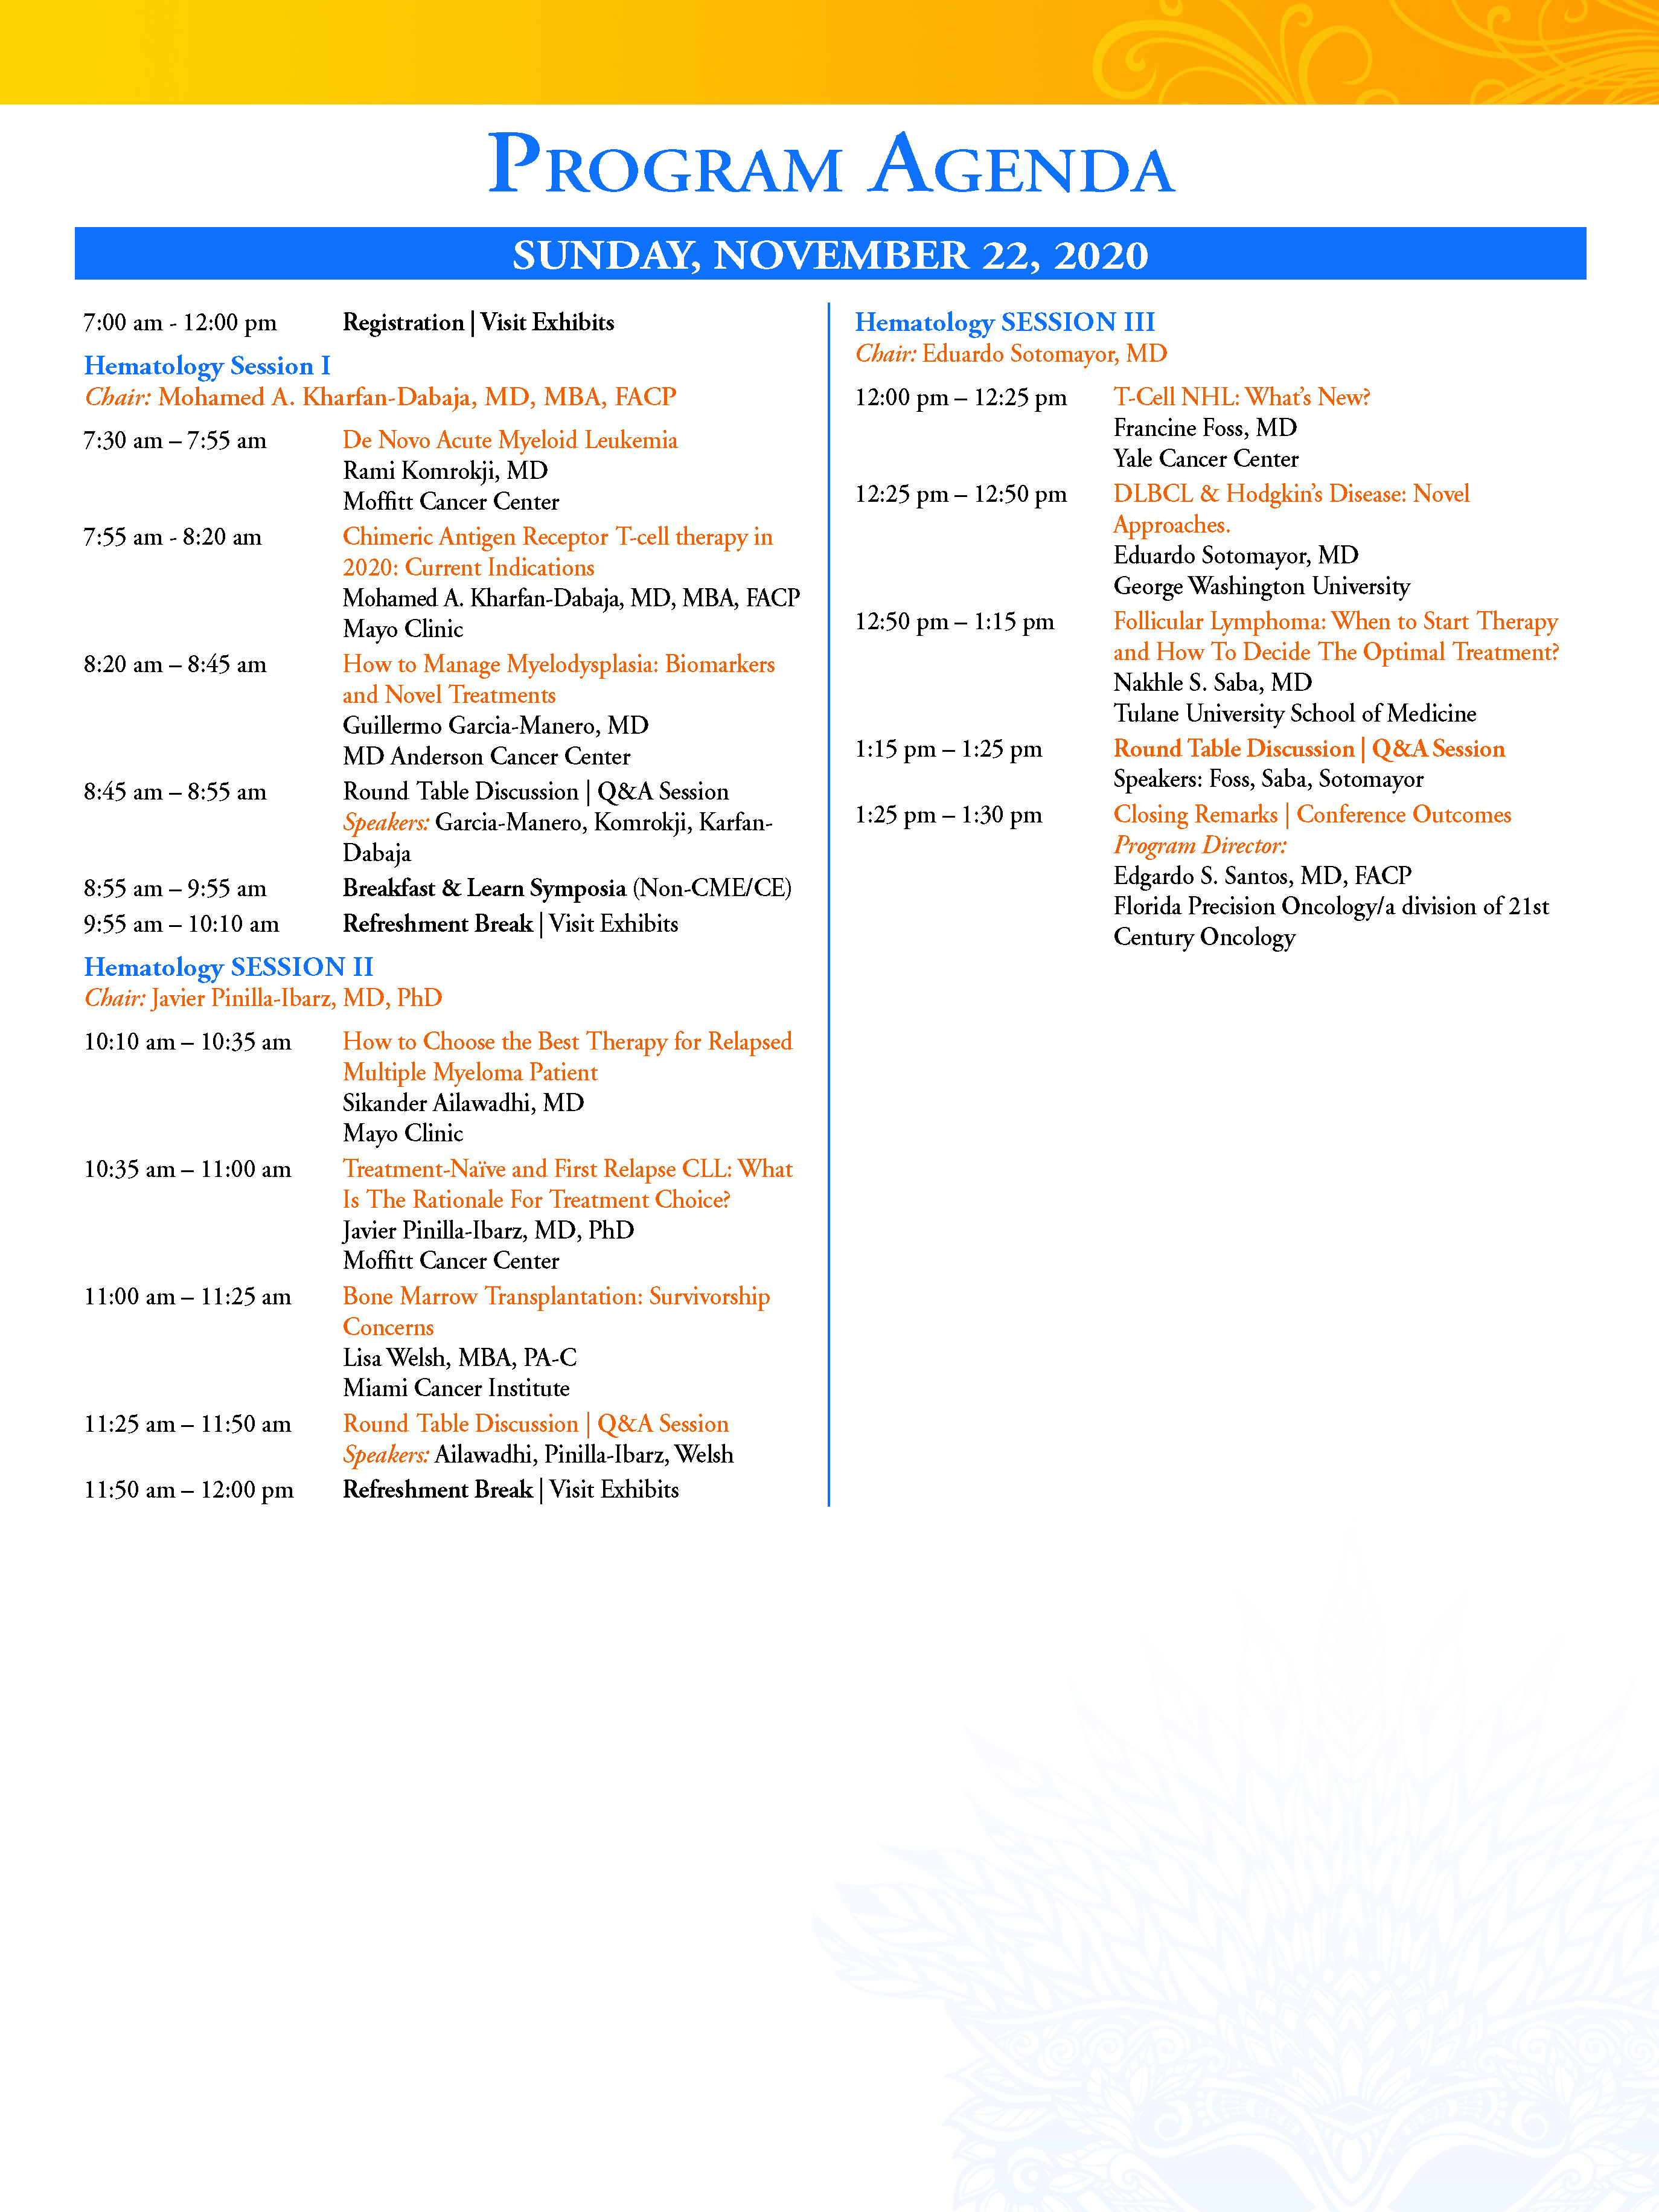 123434_NOLA 2020 Agenda Sunday